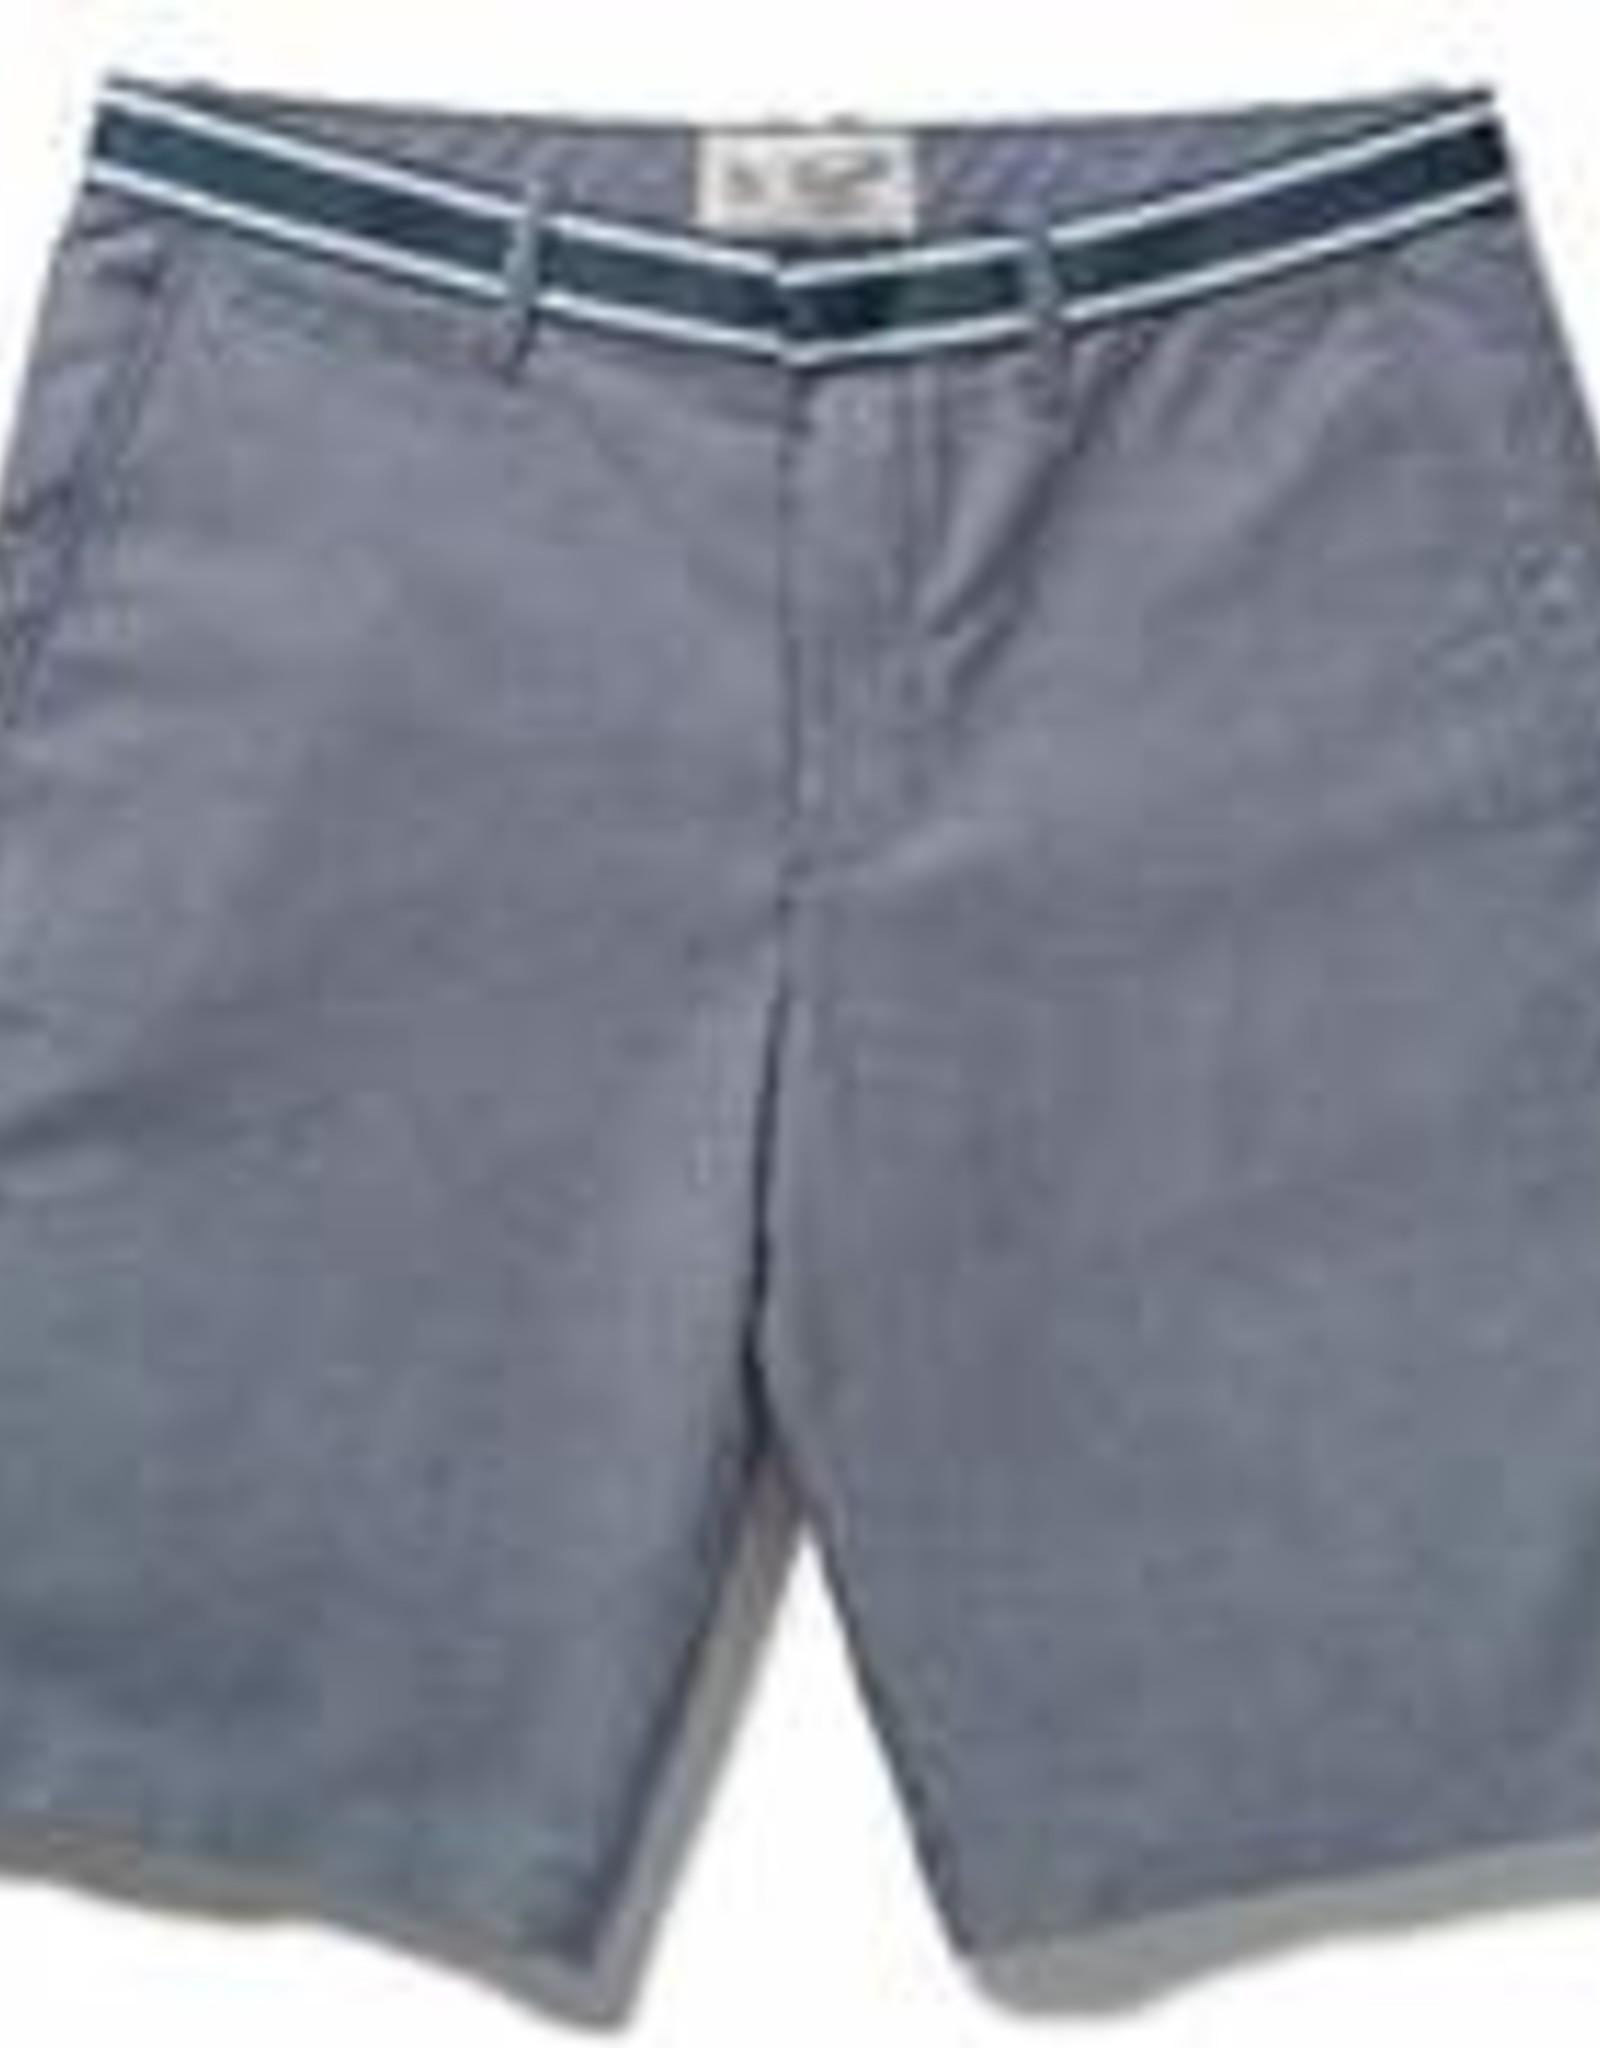 Penguin Grosgrain Trim Oxford Shorts